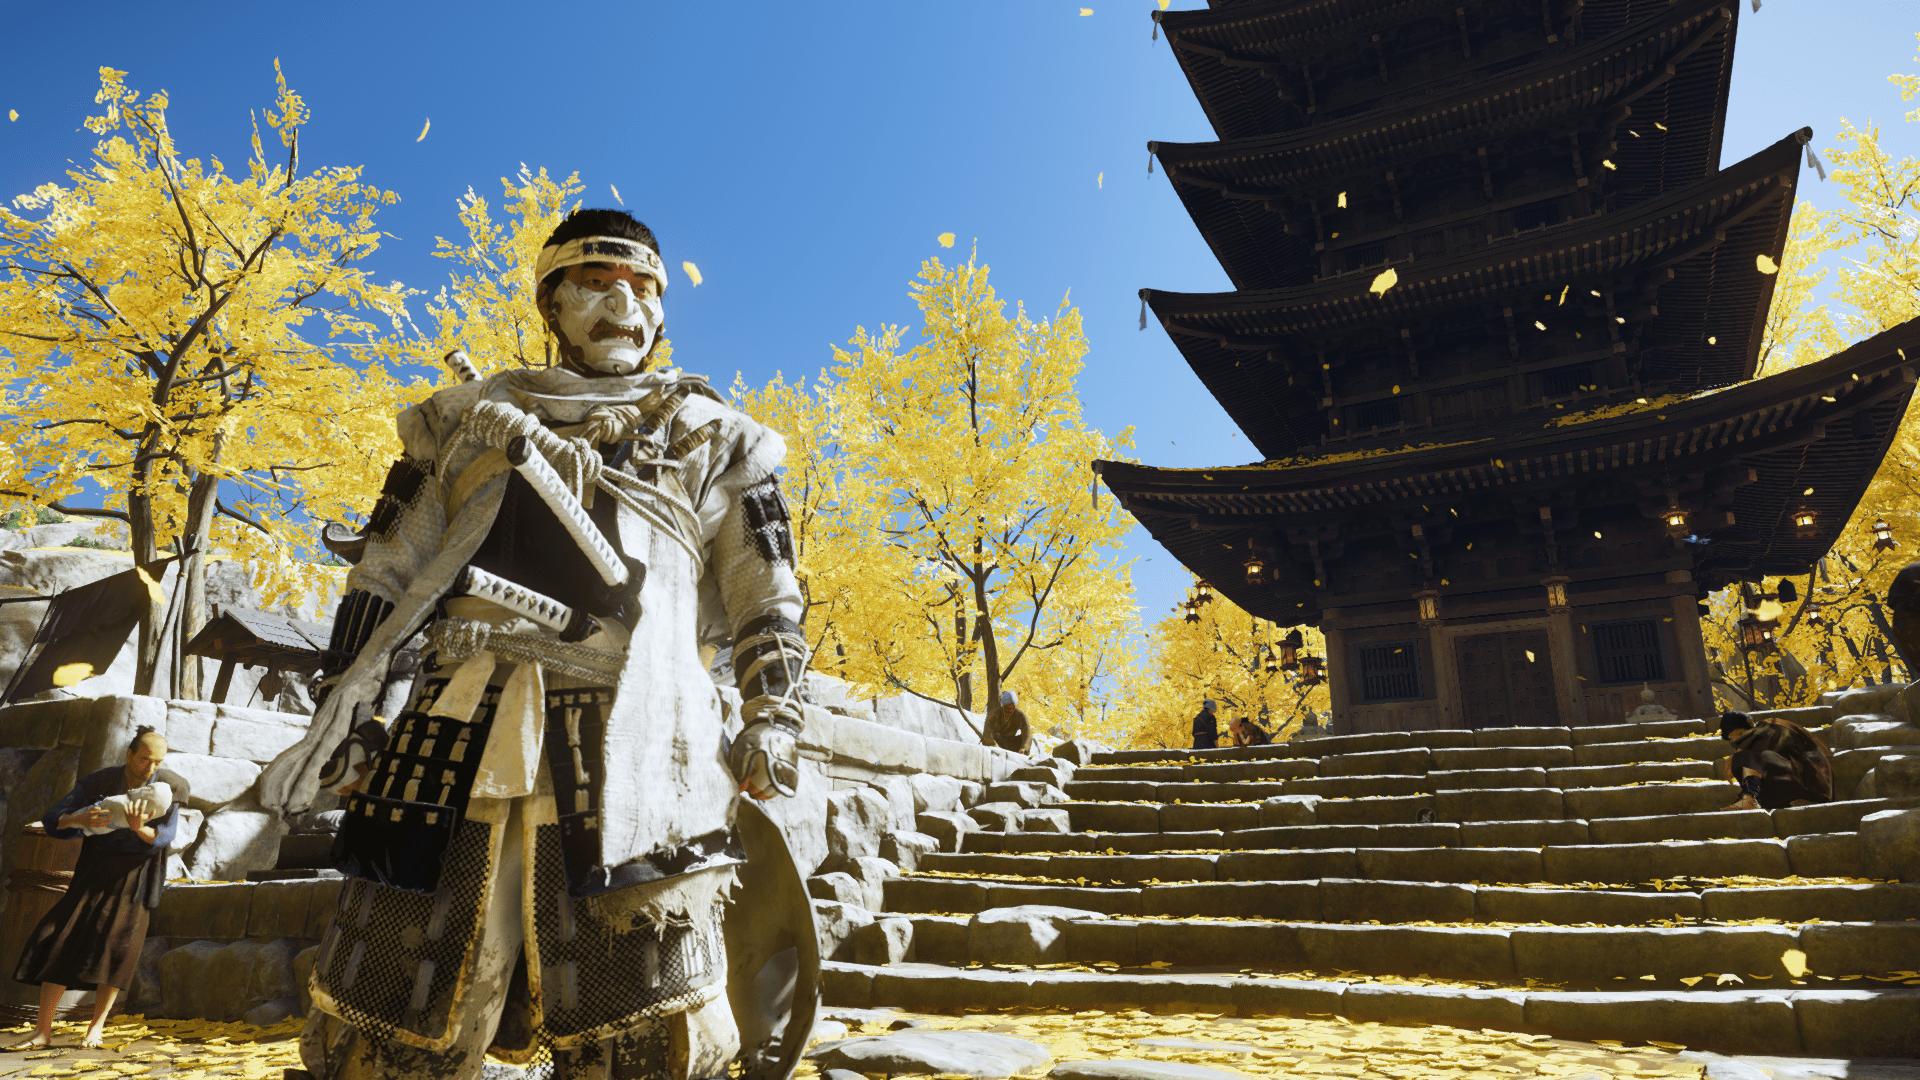 Giappone Feudale: 4 Videogiochi Più Caratteristici 14 - Hynerd.it